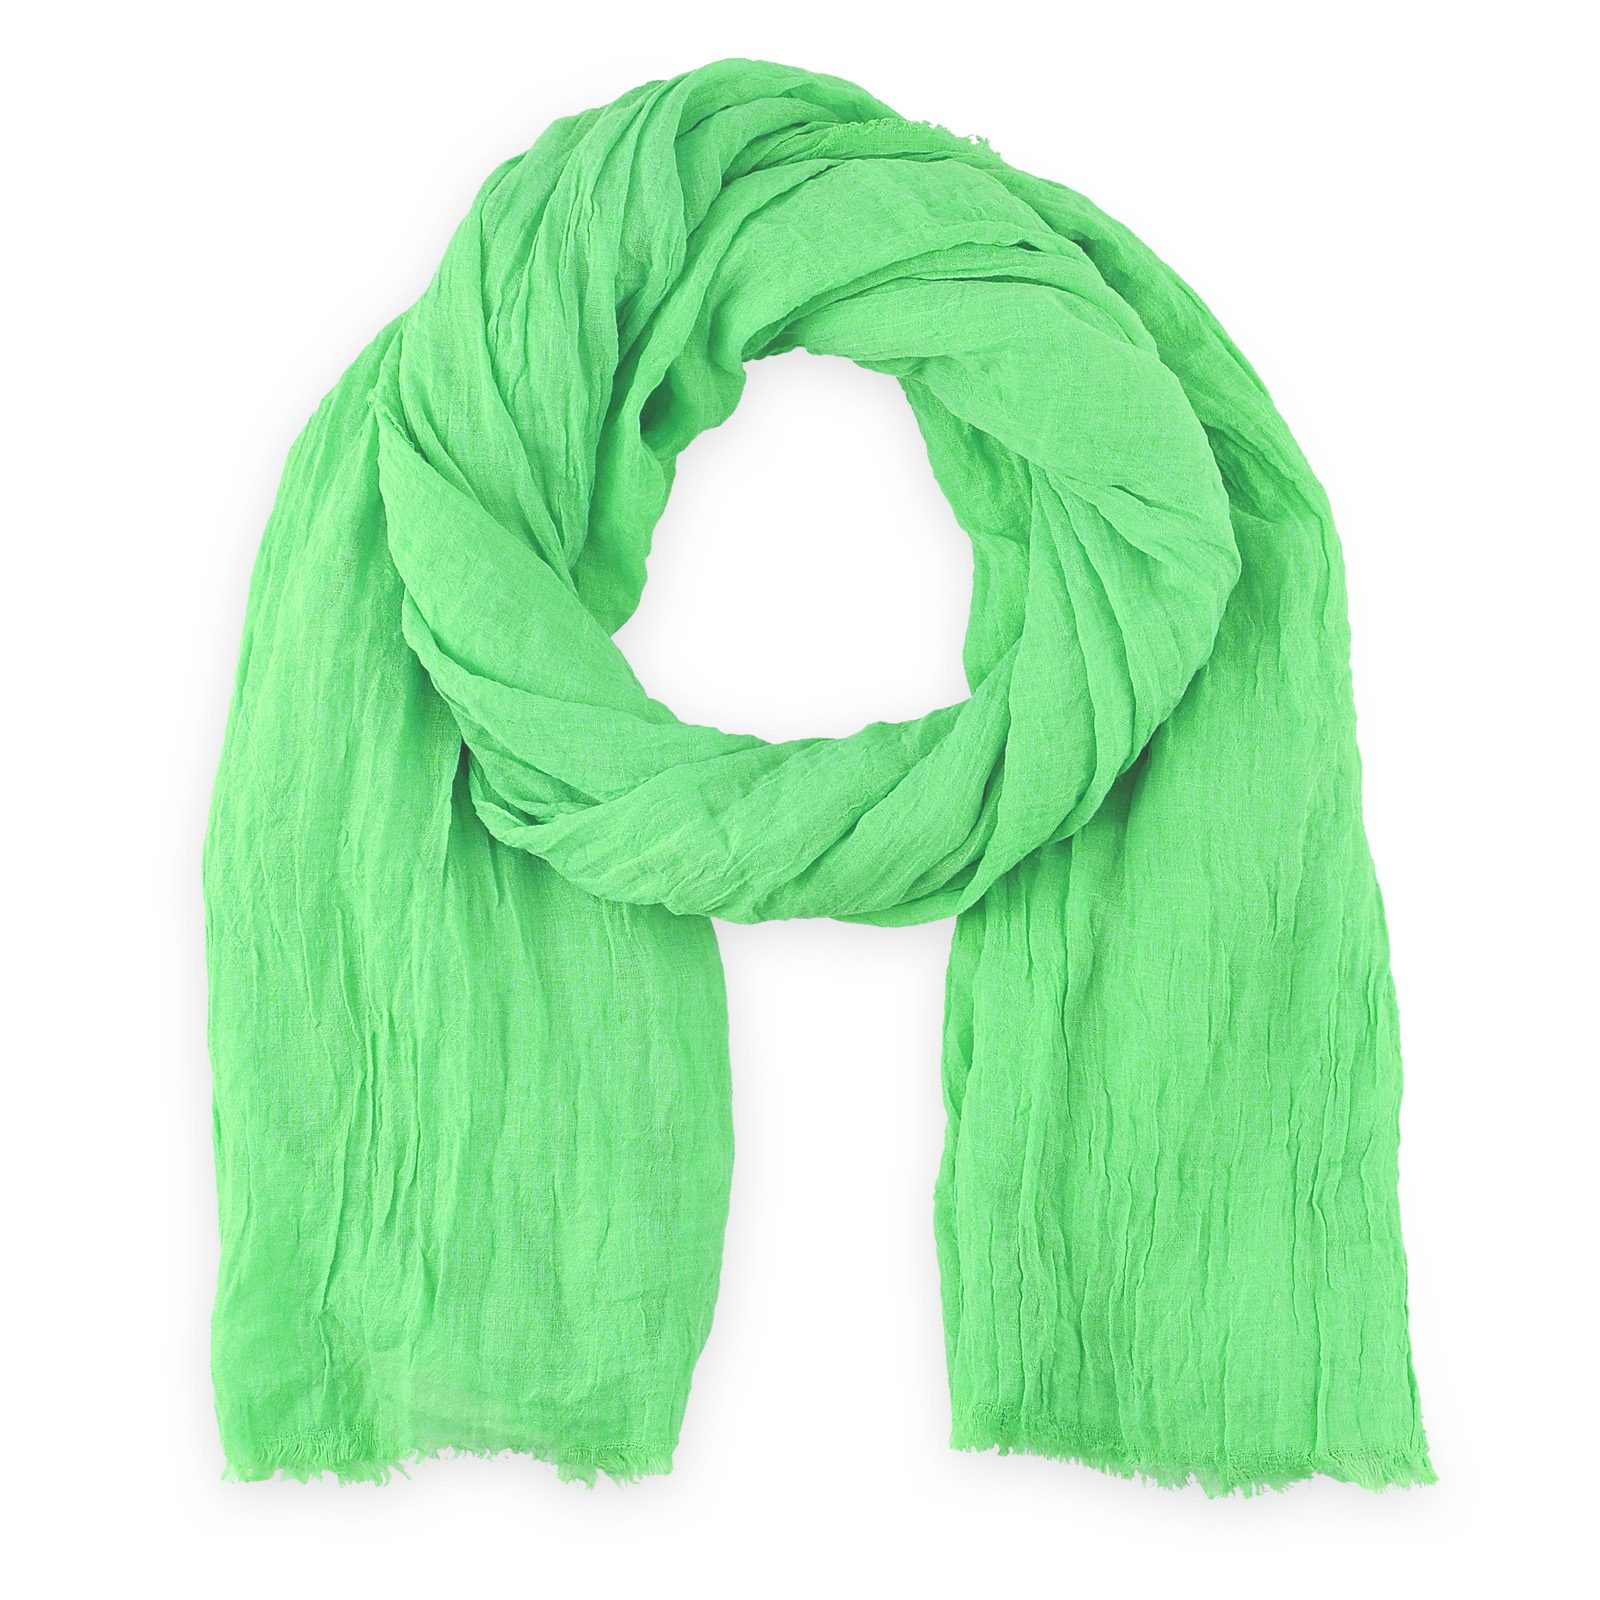 http://lookbook.allee-du-foulard.fr/wp-content/uploads/2018/11/AT-03078-F16-1600x1600.jpg